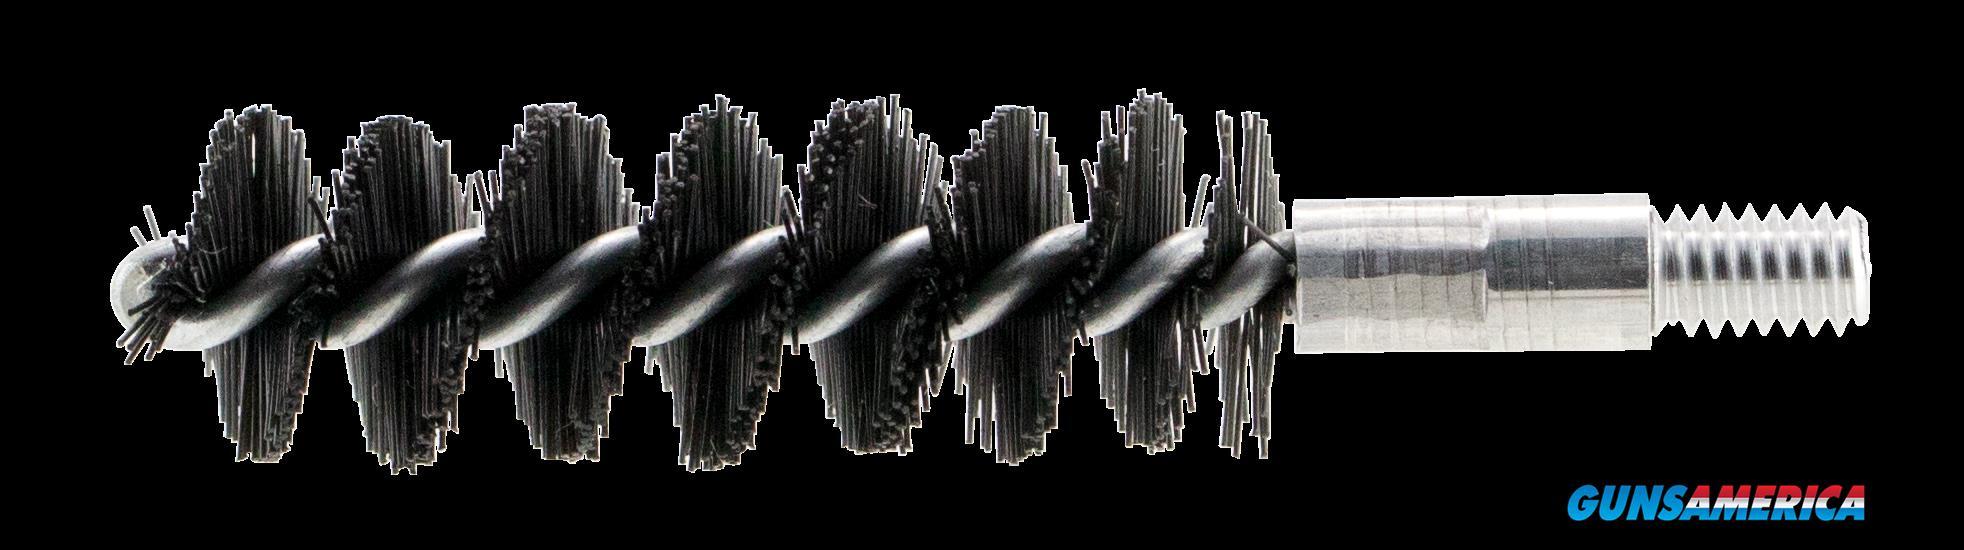 Bore Tech Proof-positive, Btech Btnp-44-003  Prof Pos Nyln  .45   3pk  Guns > Pistols > 1911 Pistol Copies (non-Colt)